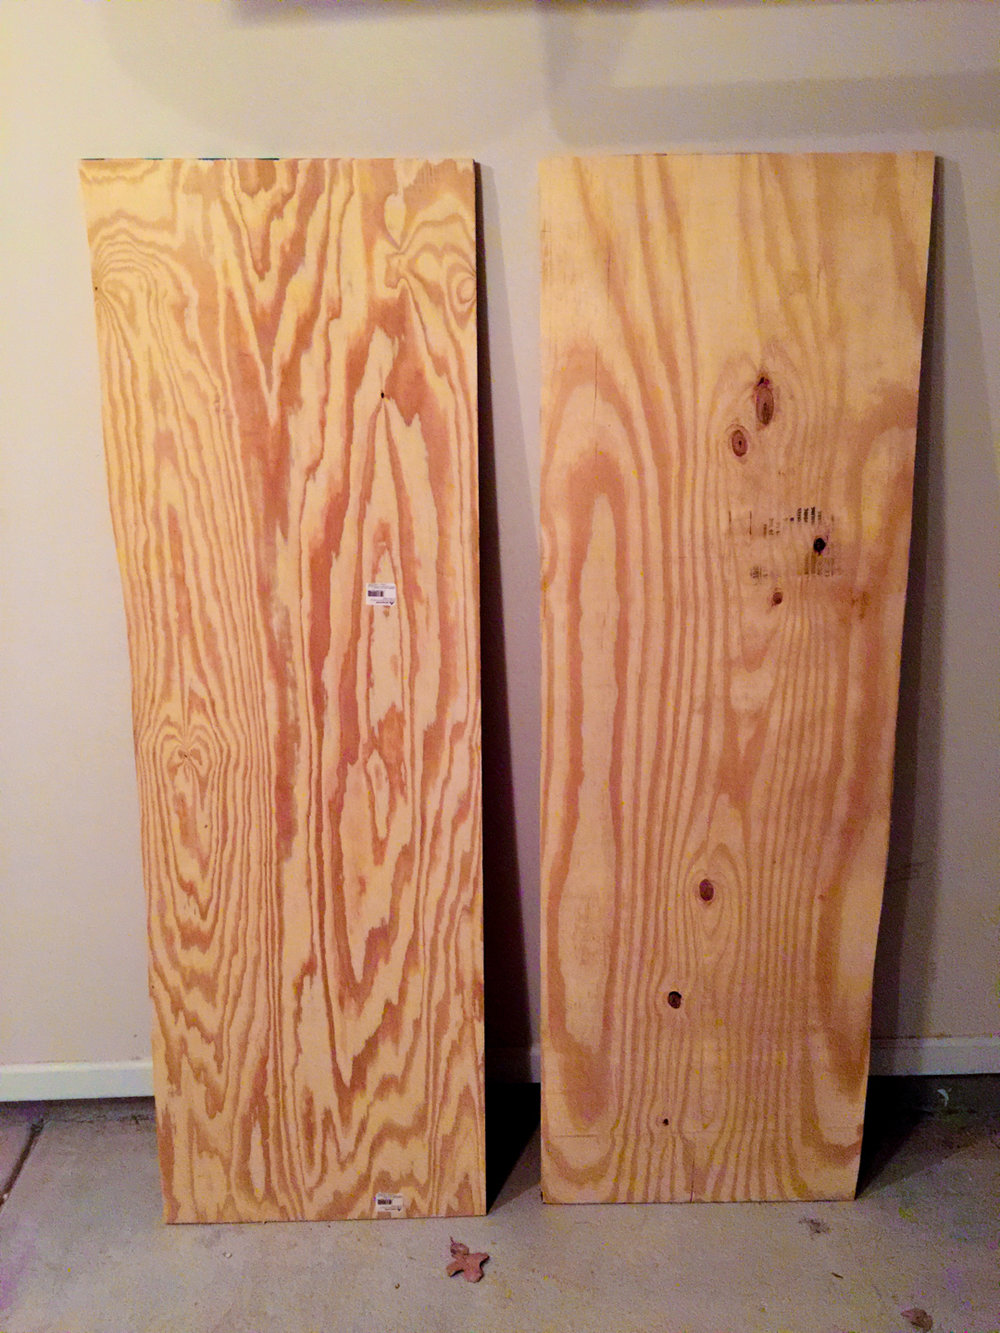 First Workbench - Rough Cut Plywood